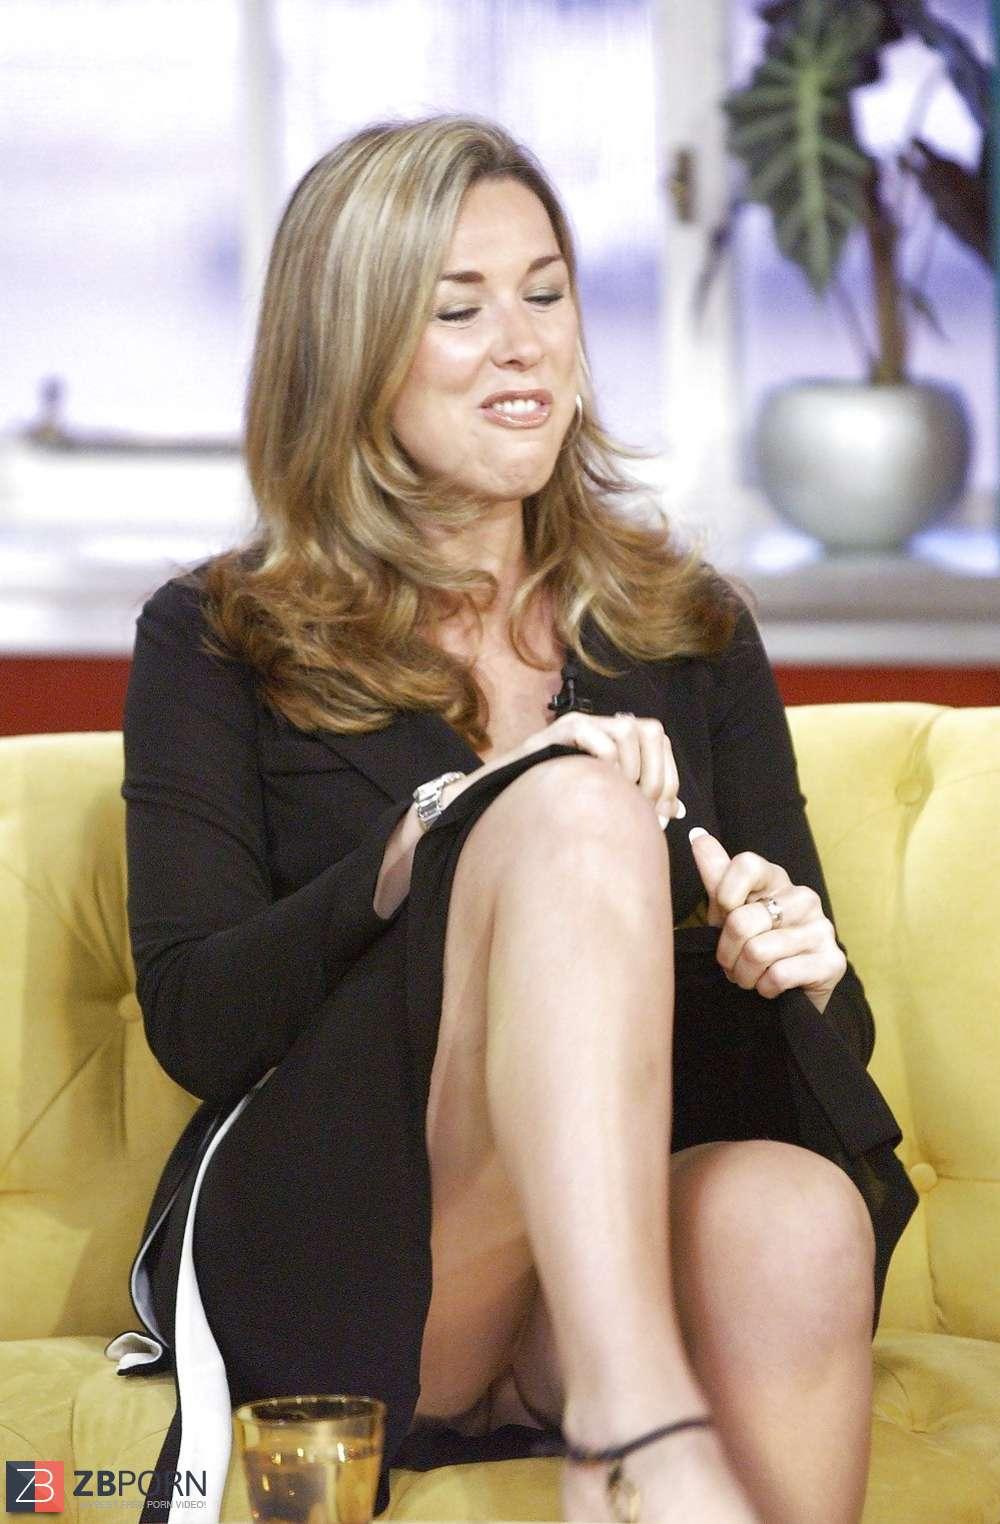 News anchor nipslips, no panties photo